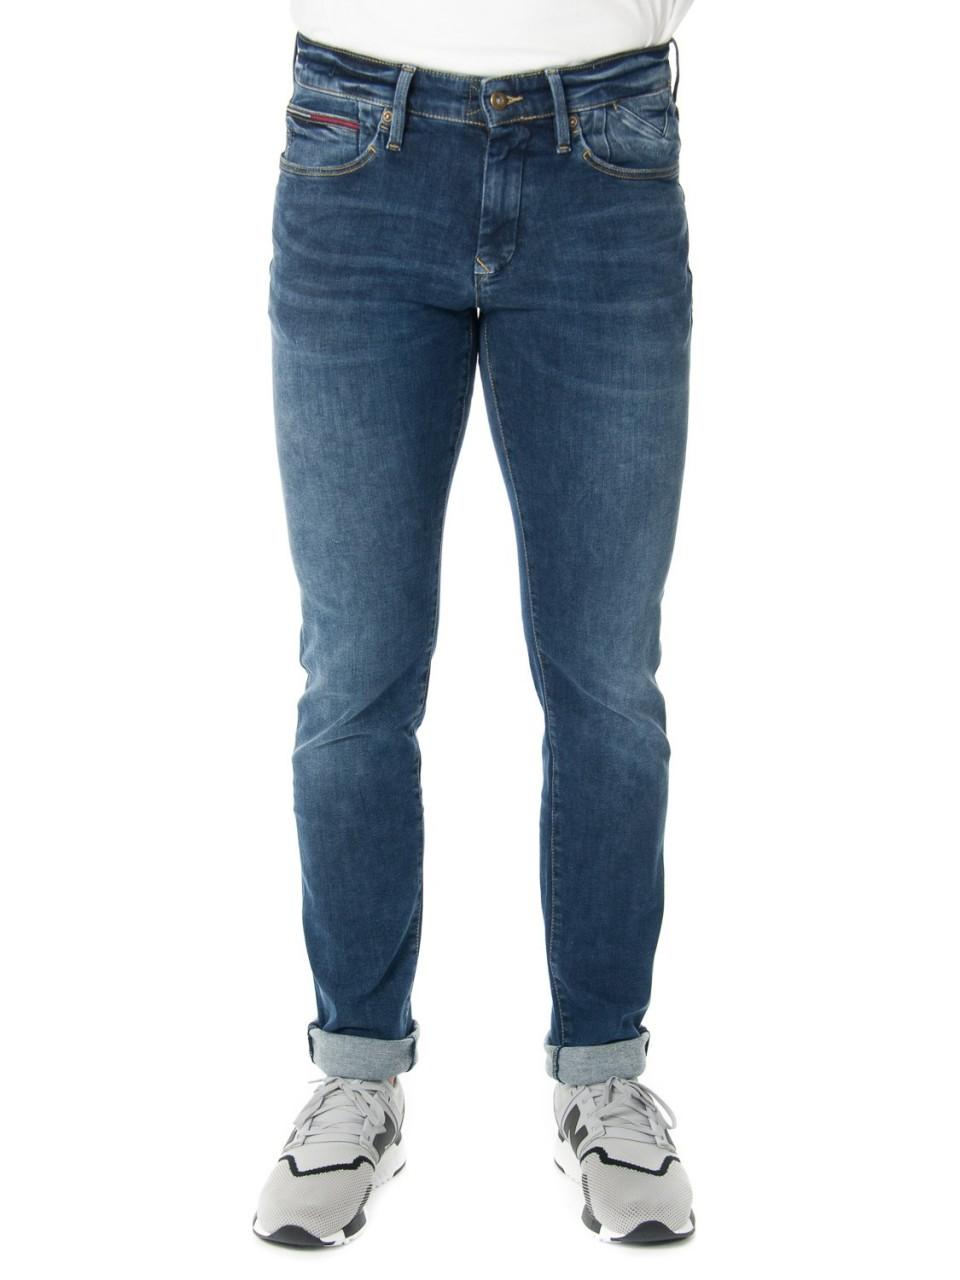 Tommy hilfiger Uomo Jeans Tommy Hilfiger Uomo 02903G